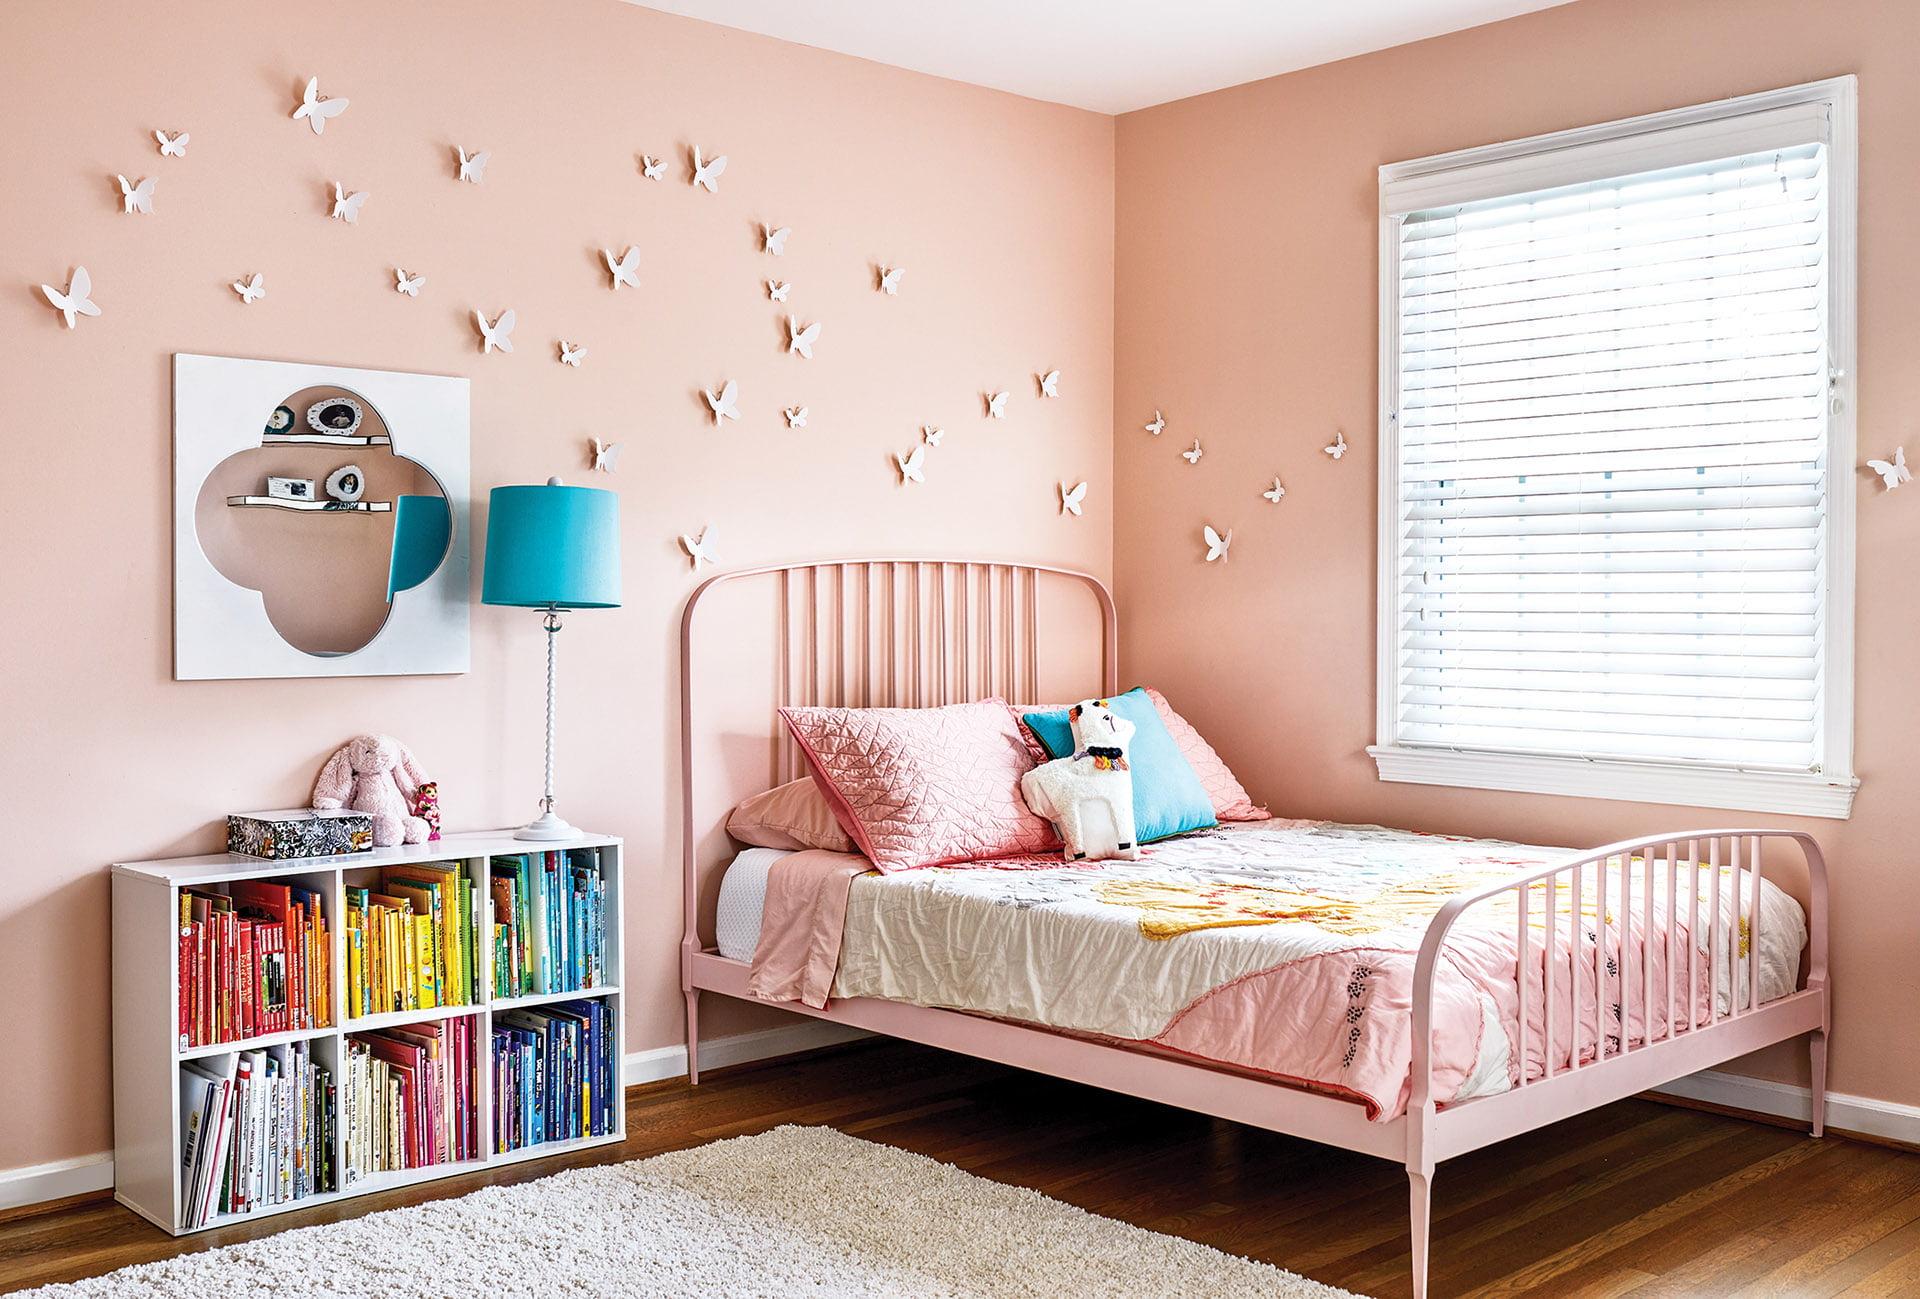 3D butterflies adorn walls painted in Sherwin-Williams Romance in girl's bedroom.